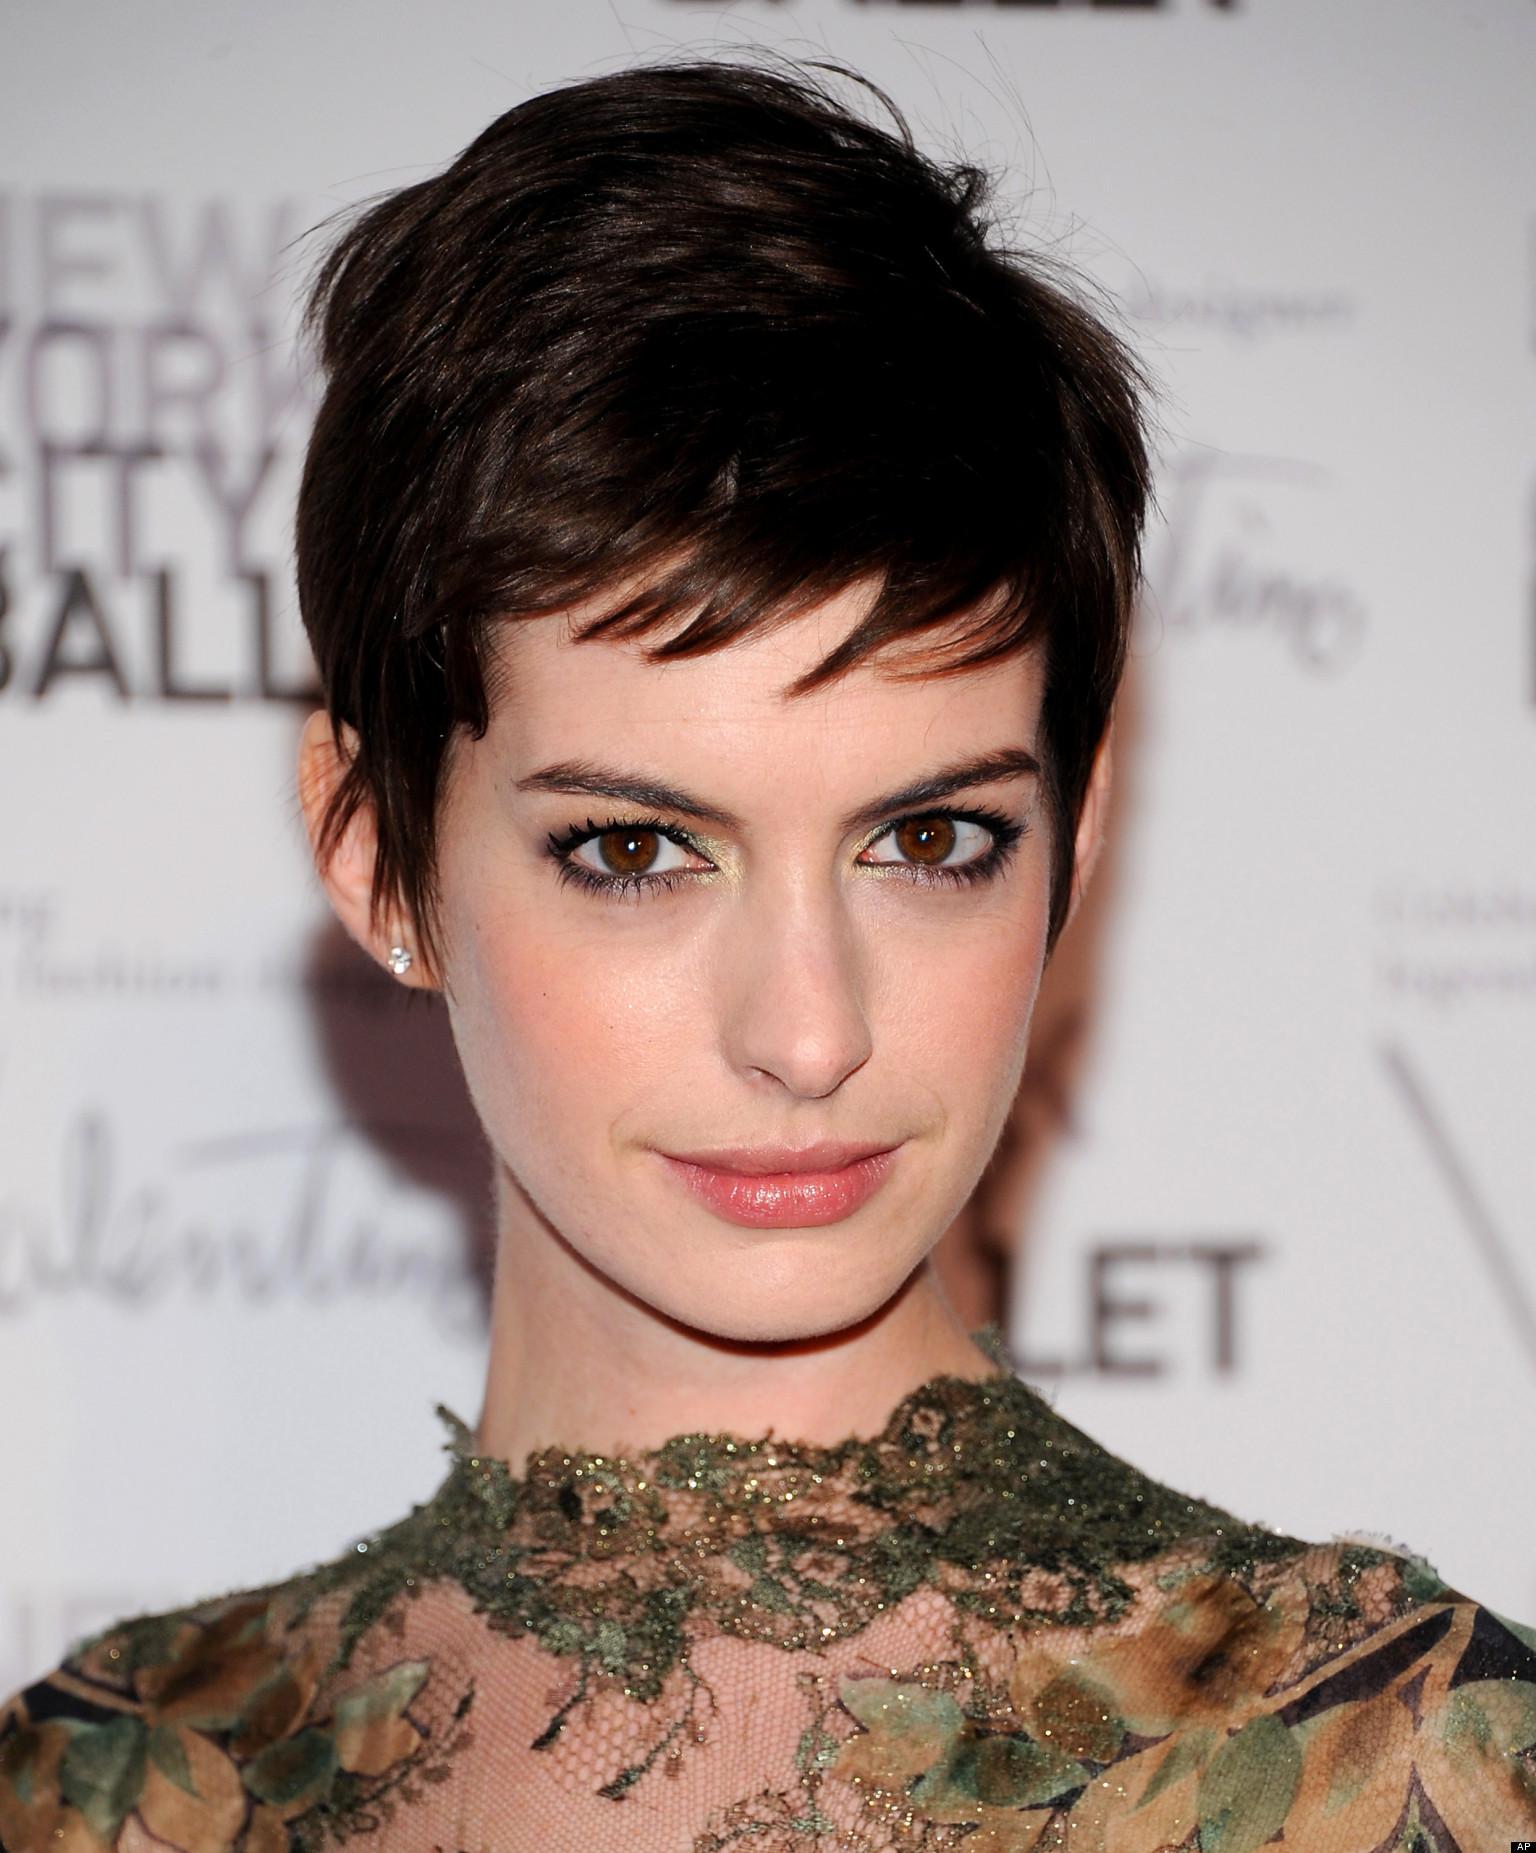 Anne Hathaway 2012 Wikipedia